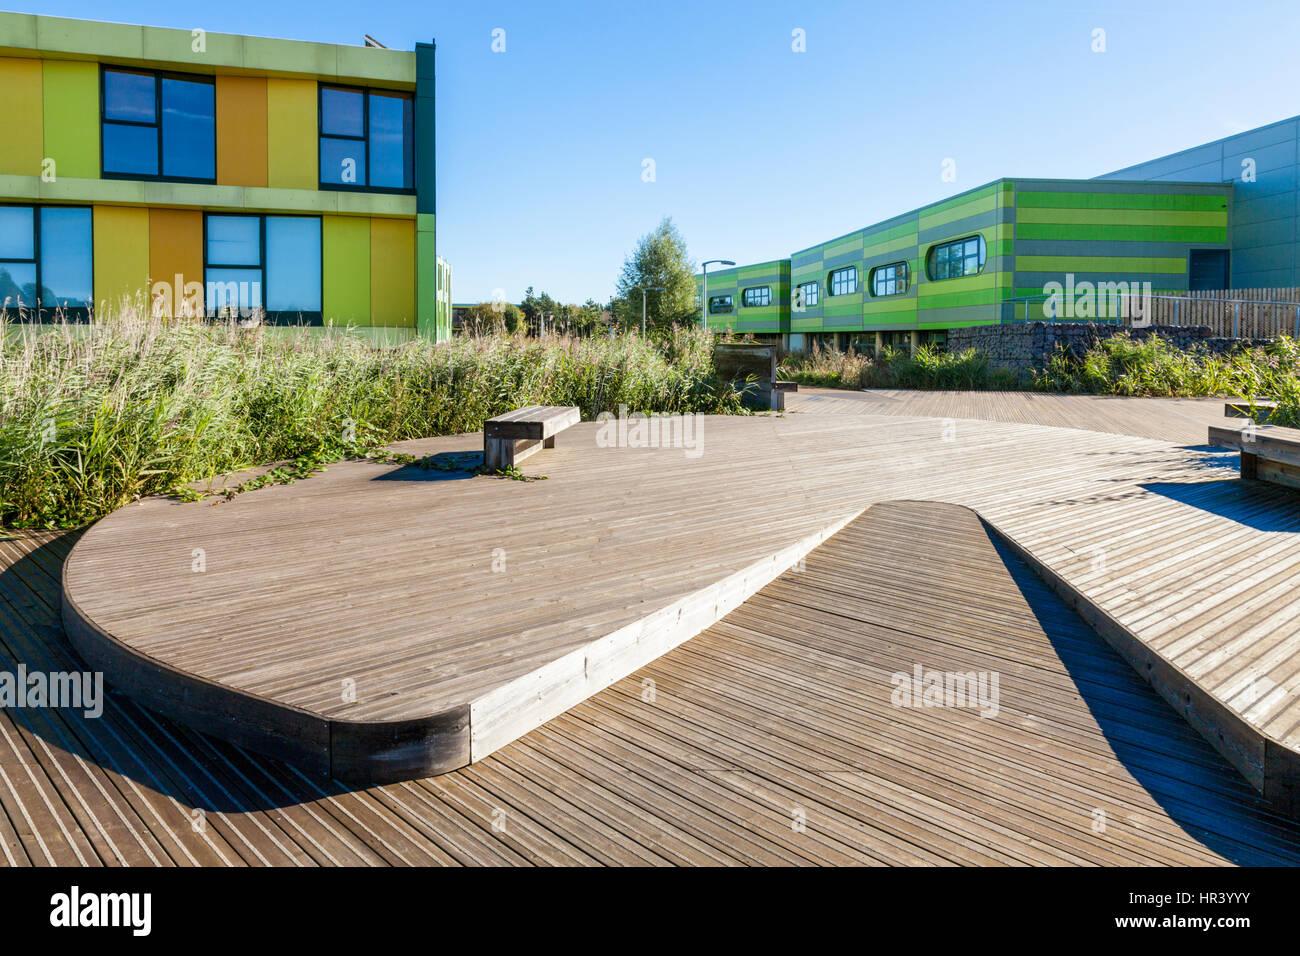 Boardwalk and buildings at the Nottingham Science Park, Nottingham, England, UK - Stock Image